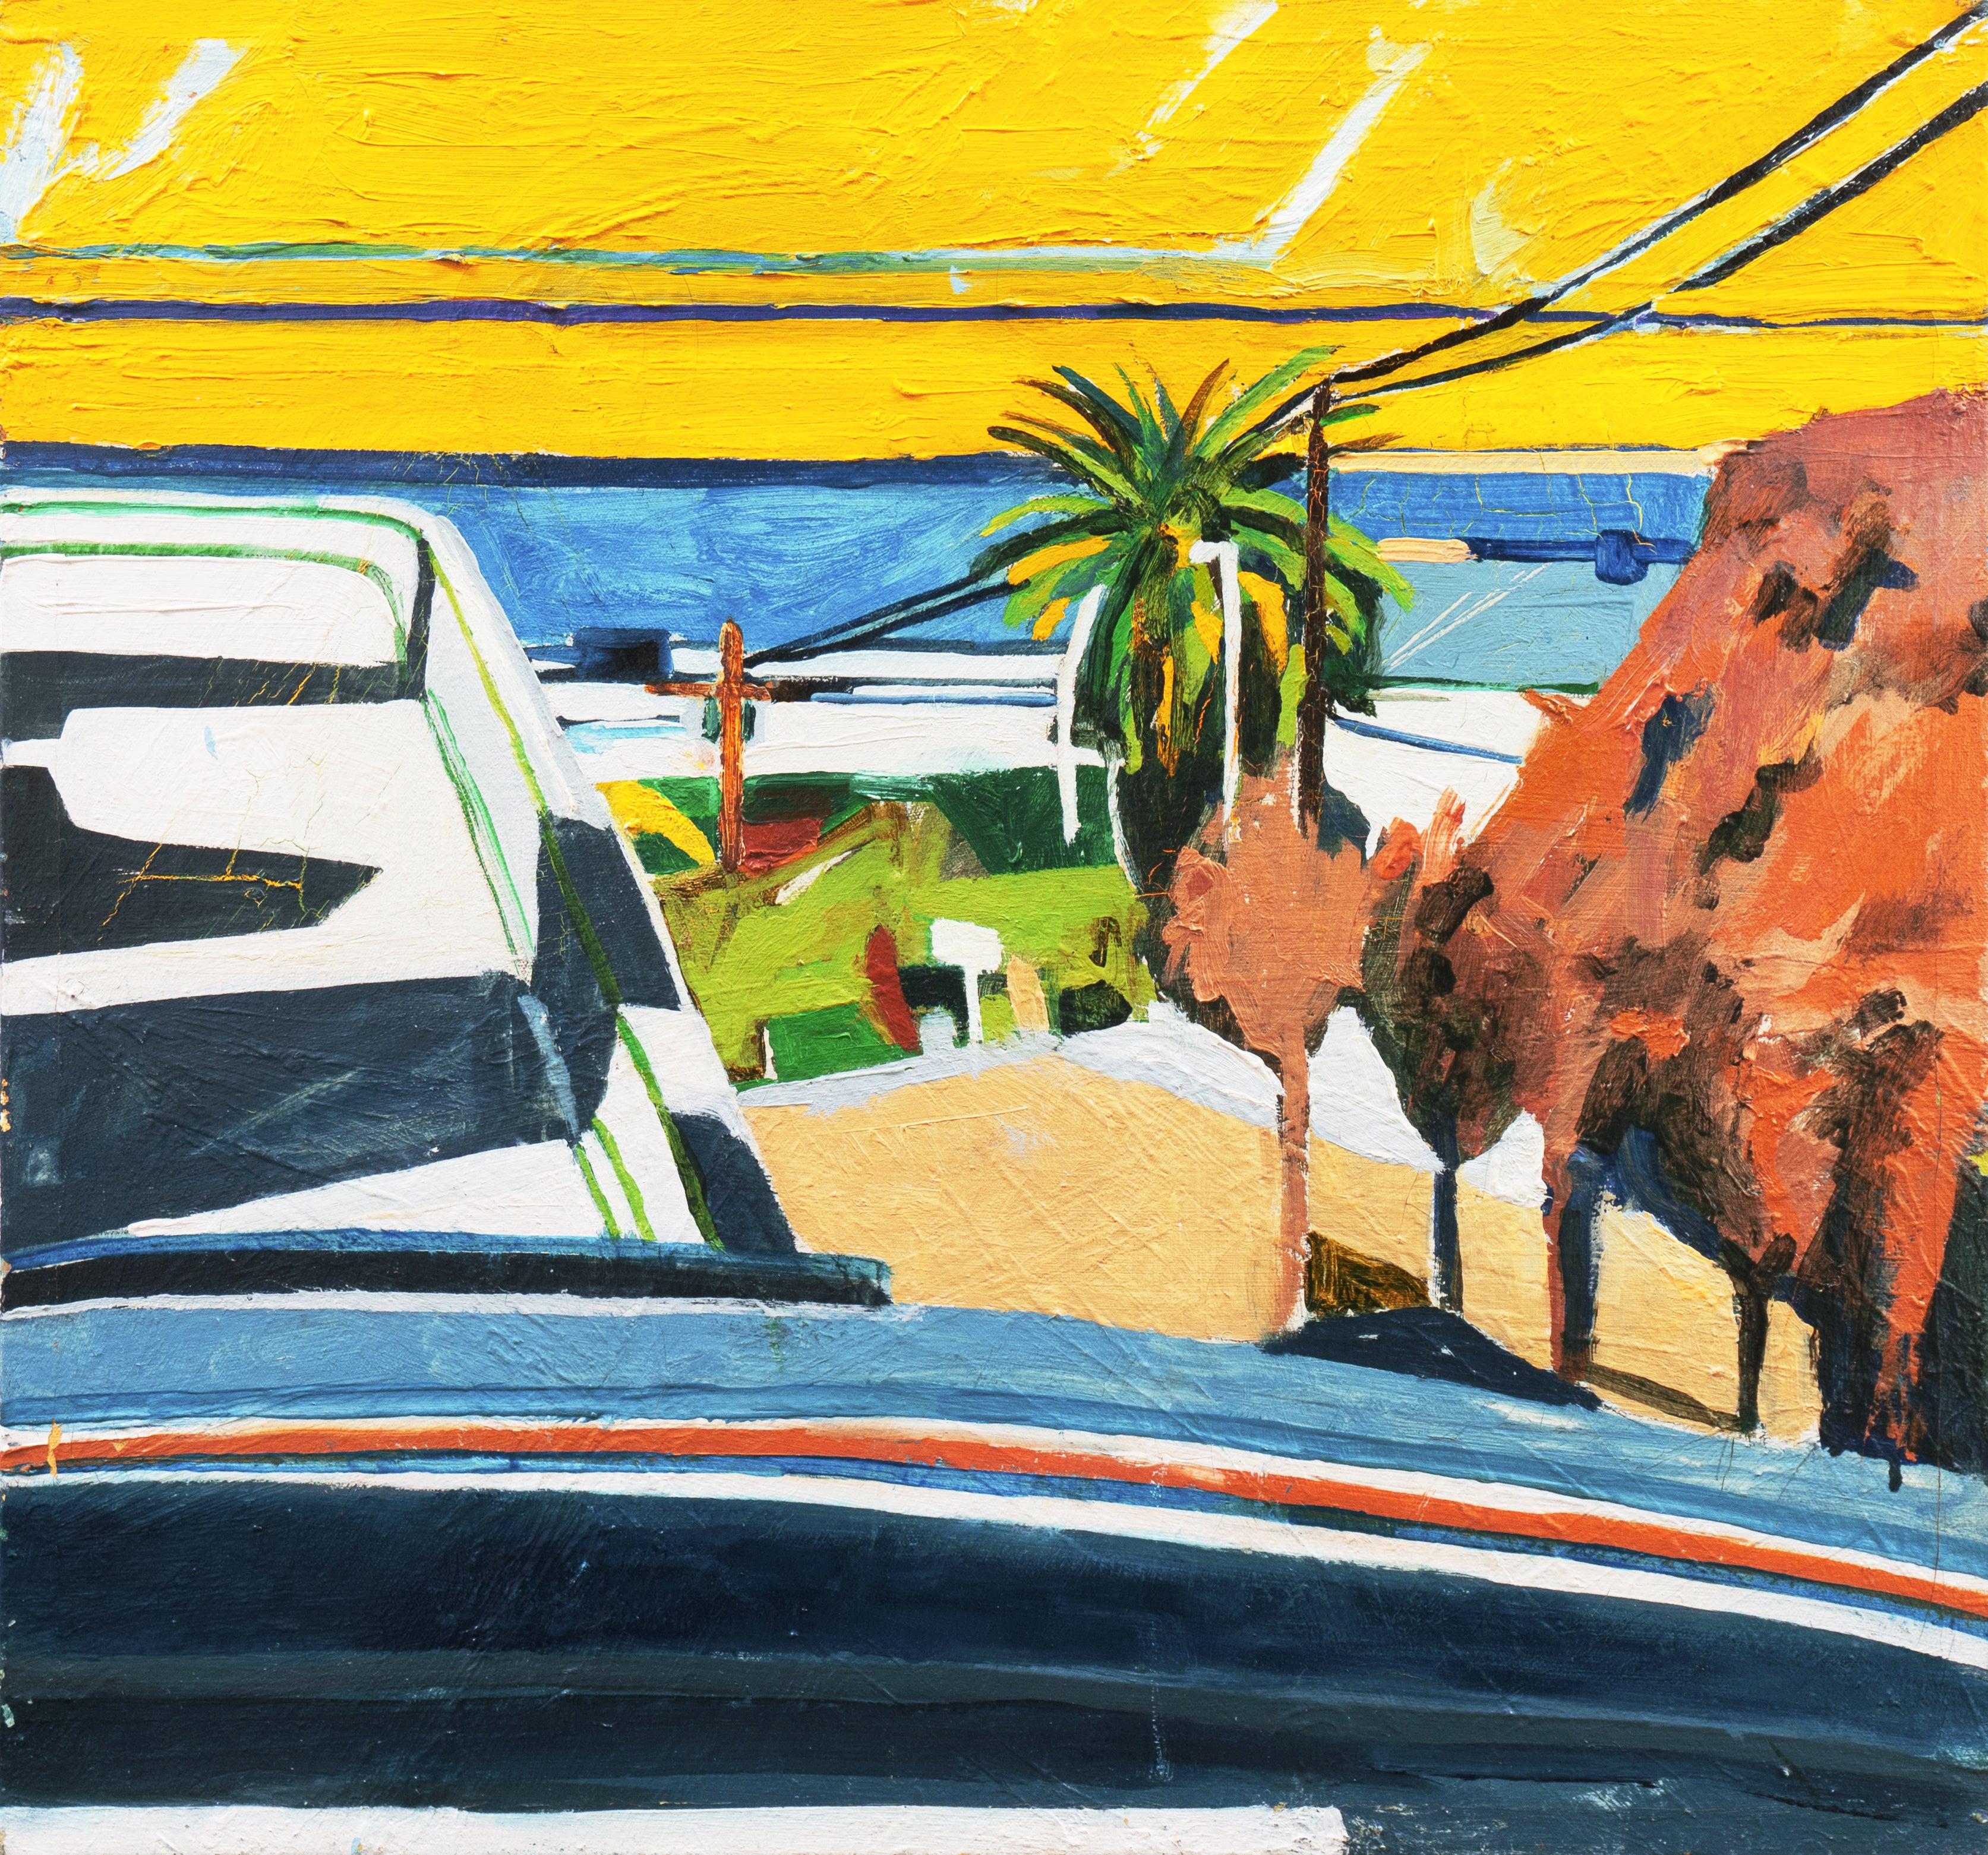 'Ocean View, California', Pasadena Art Institute, Hollywood, Urban Modernist Oil